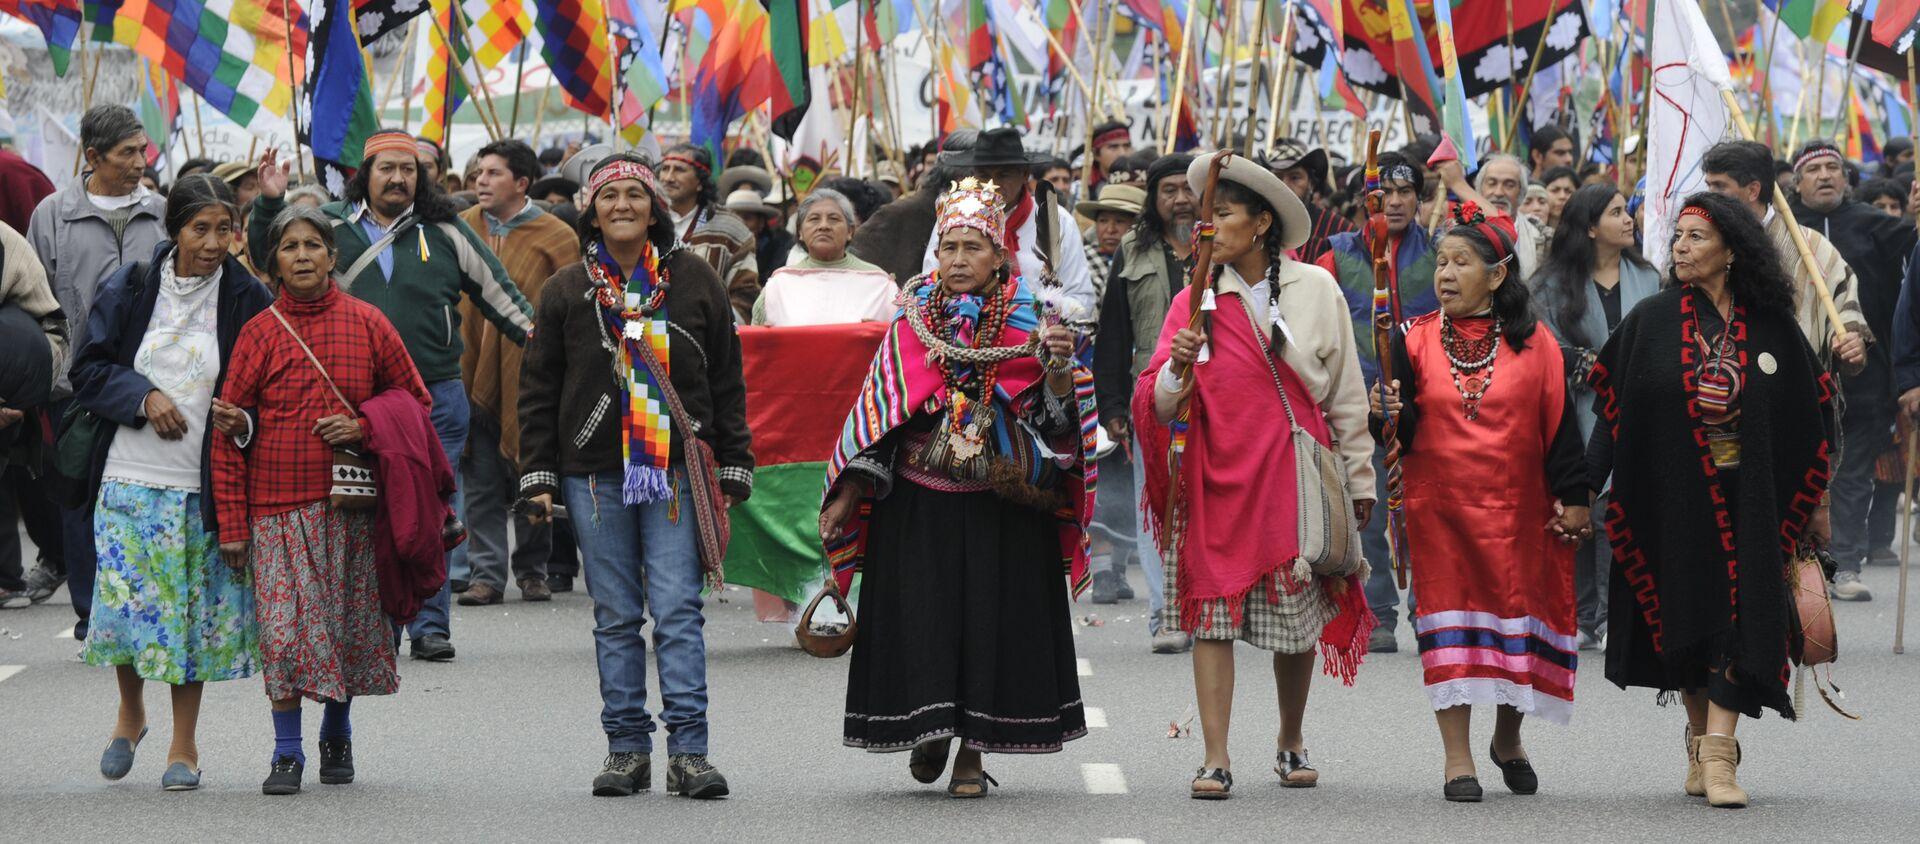 Indígenas de Argentina - Sputnik Mundo, 1920, 06.08.2020